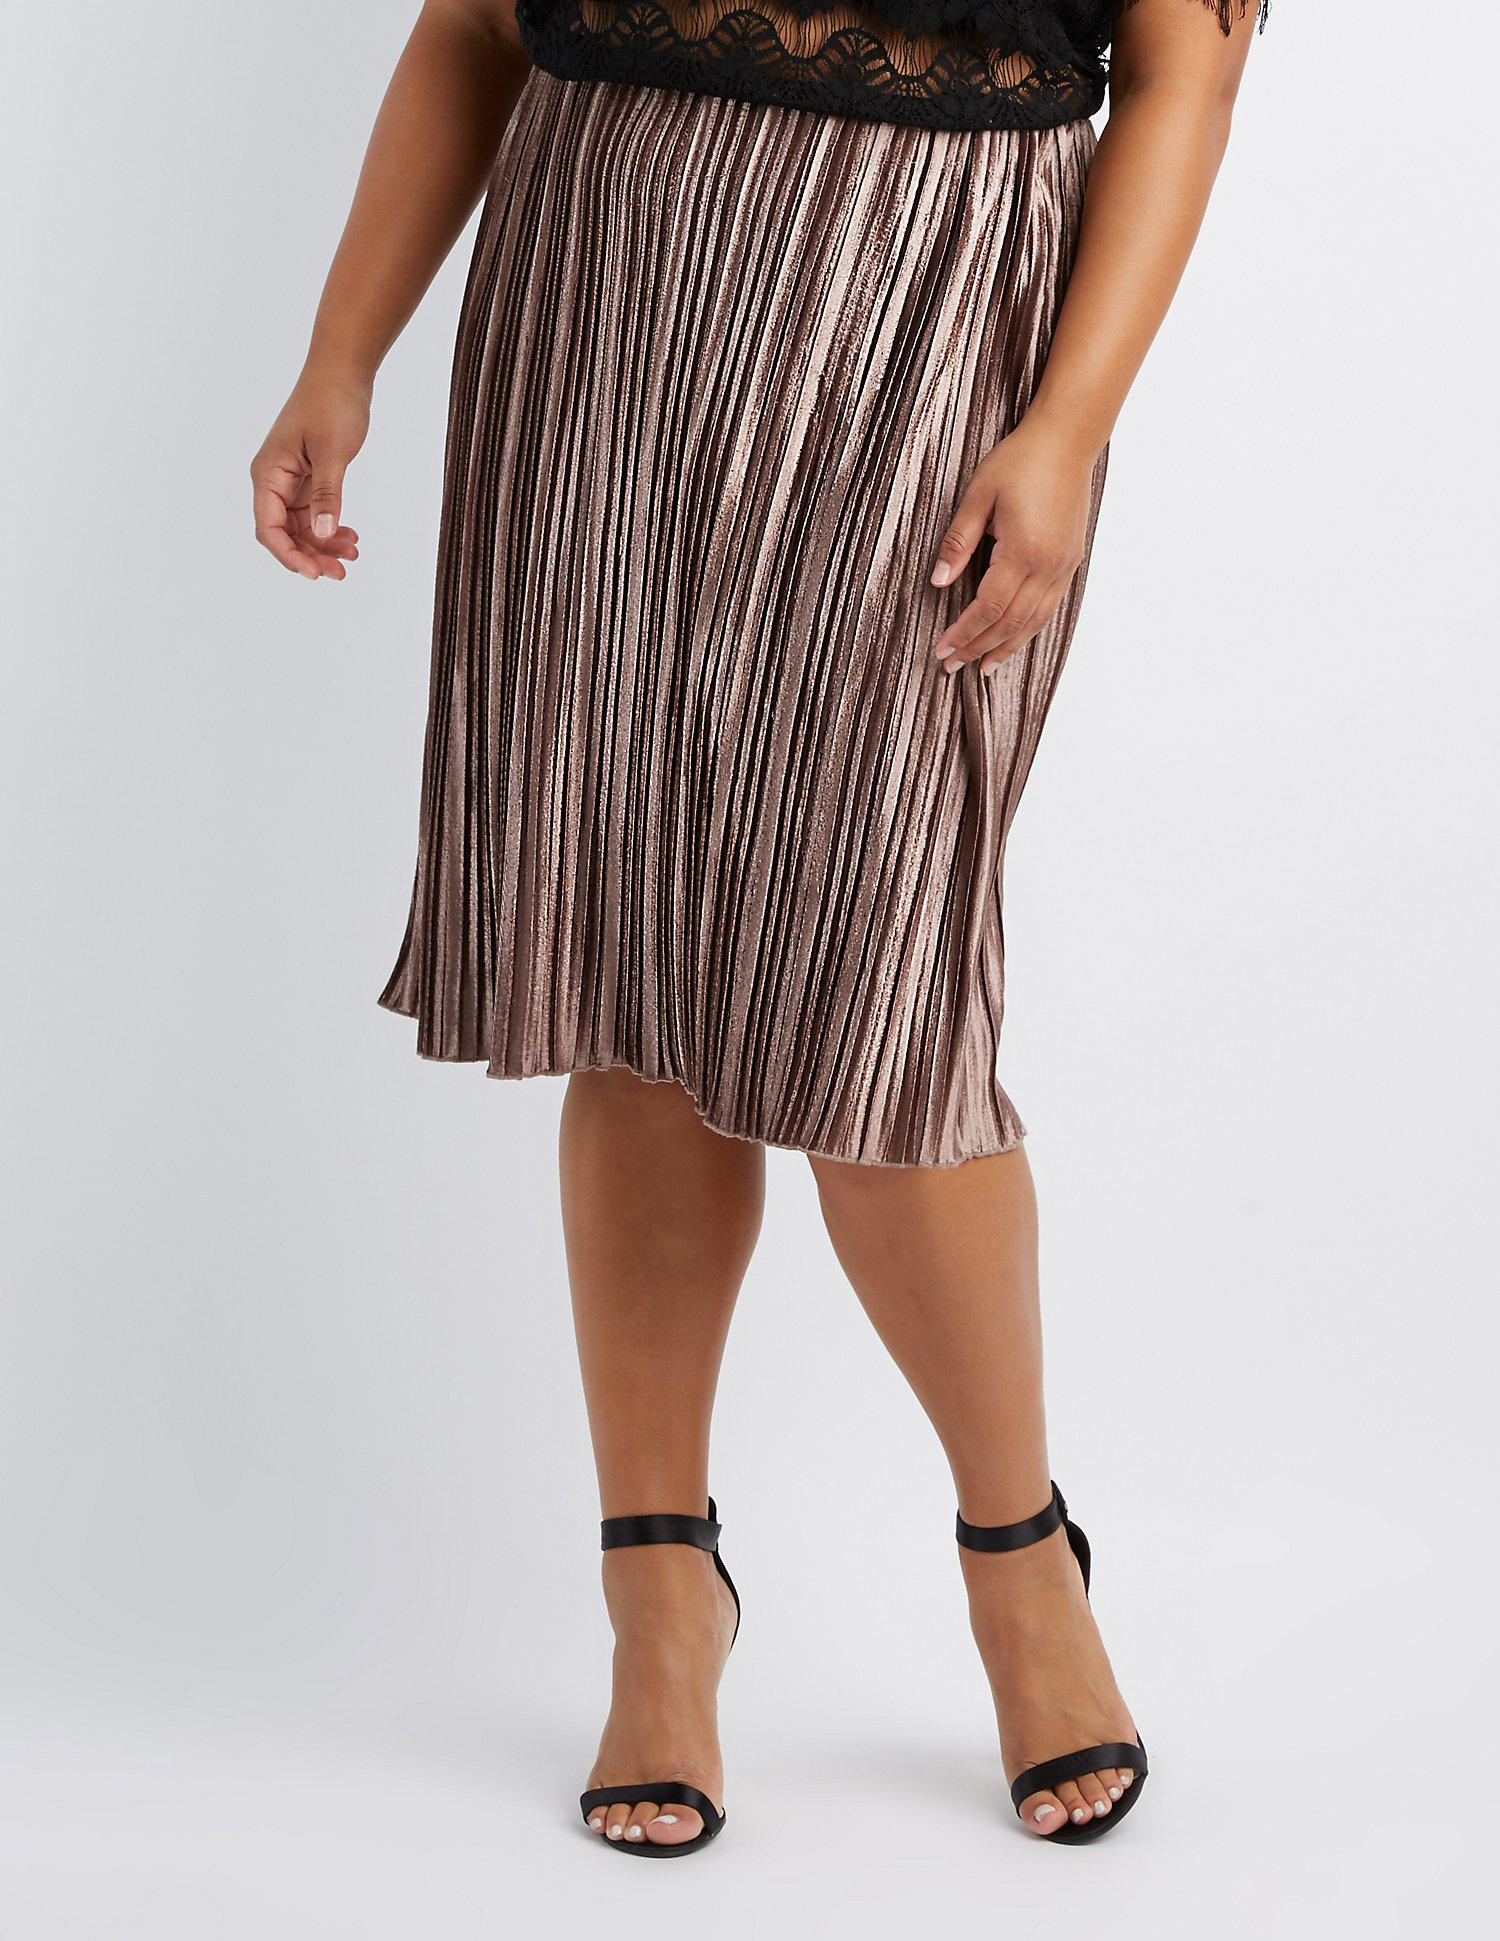 58679e2cc2 Charlotte Russe. Women's Brown Plus Size Striped Velvet Pencil Skirt